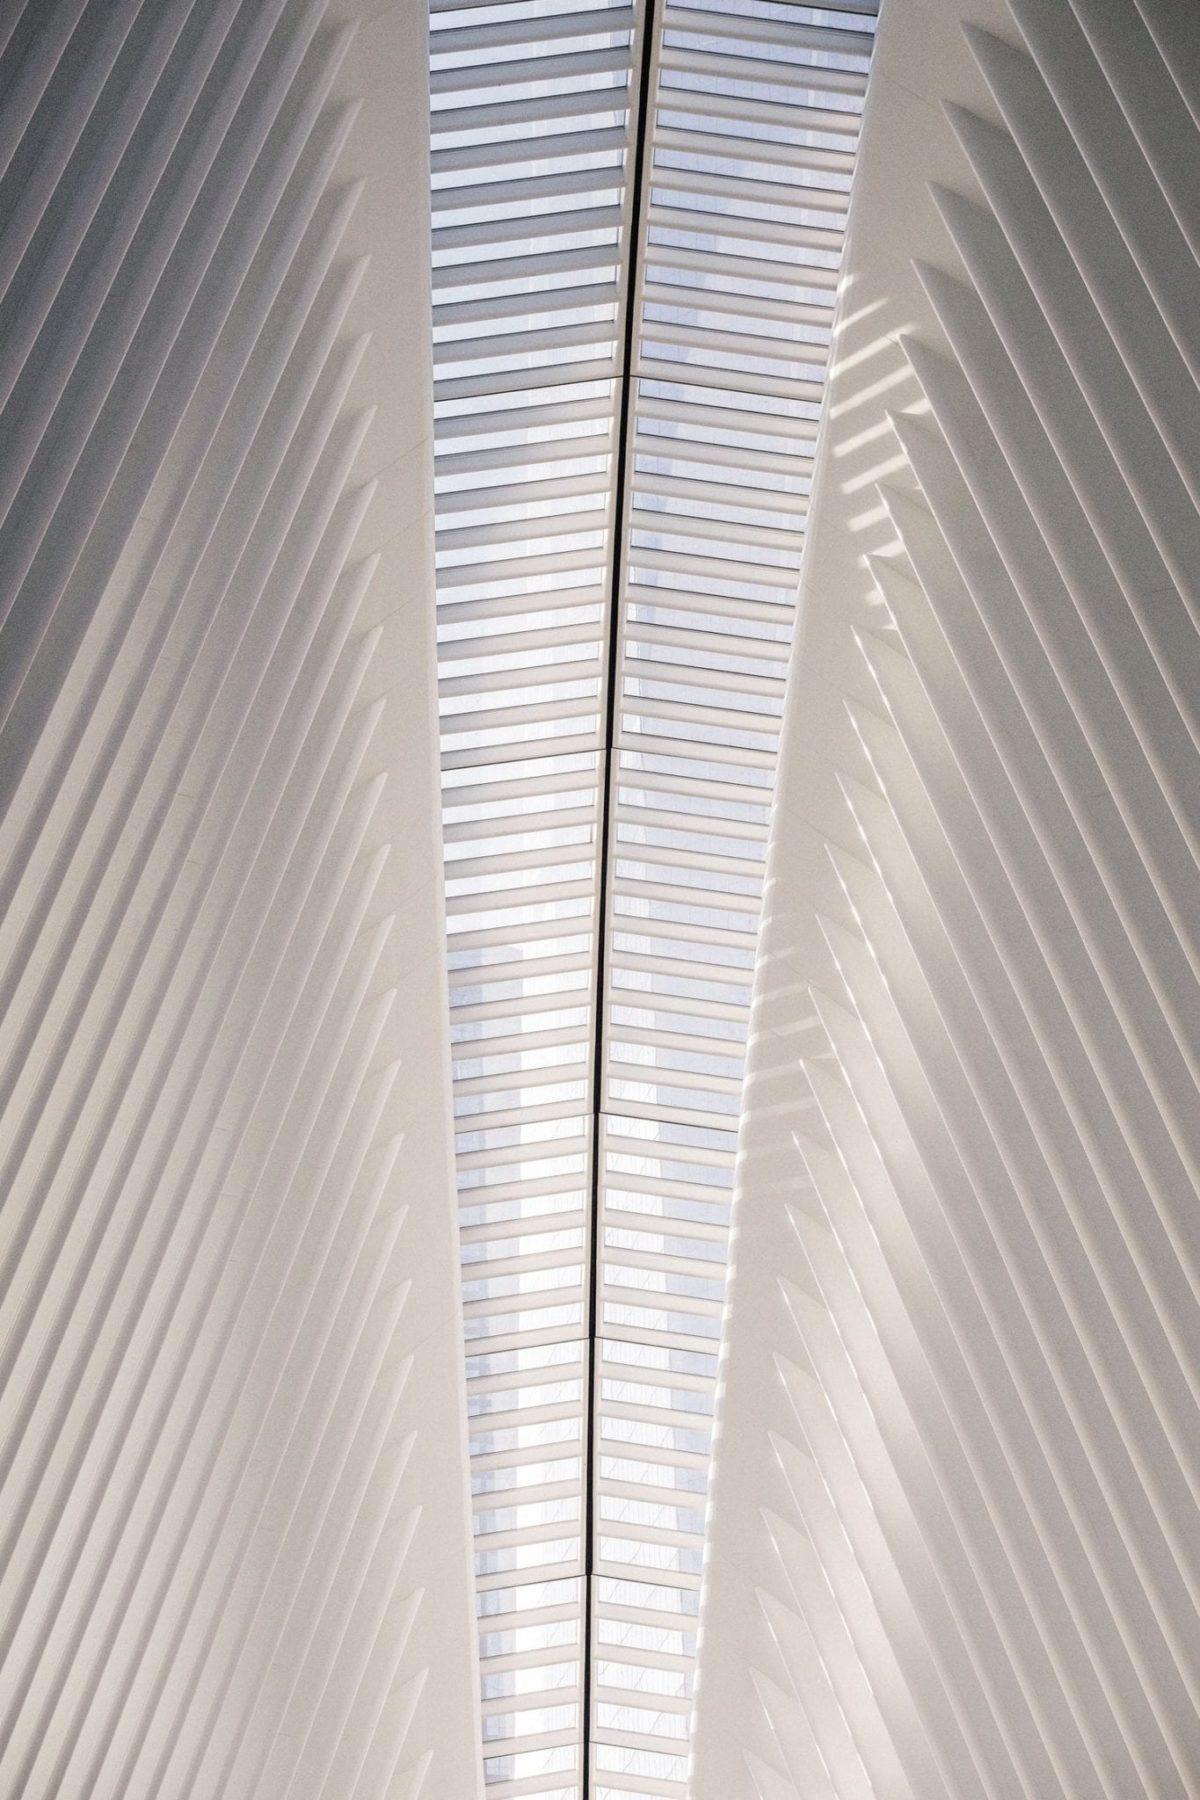 NYC Oculus WTC6